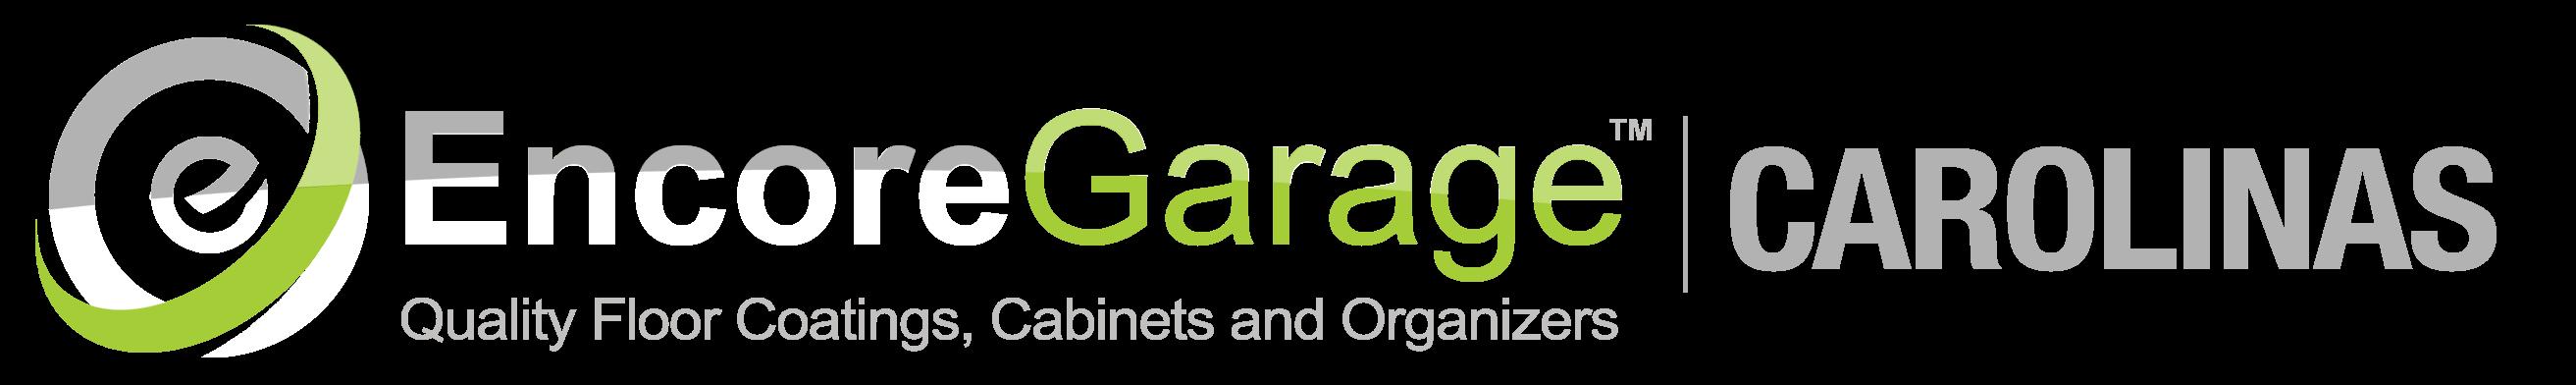 Garage clipart cluttered garage. Floor coatings storage organization